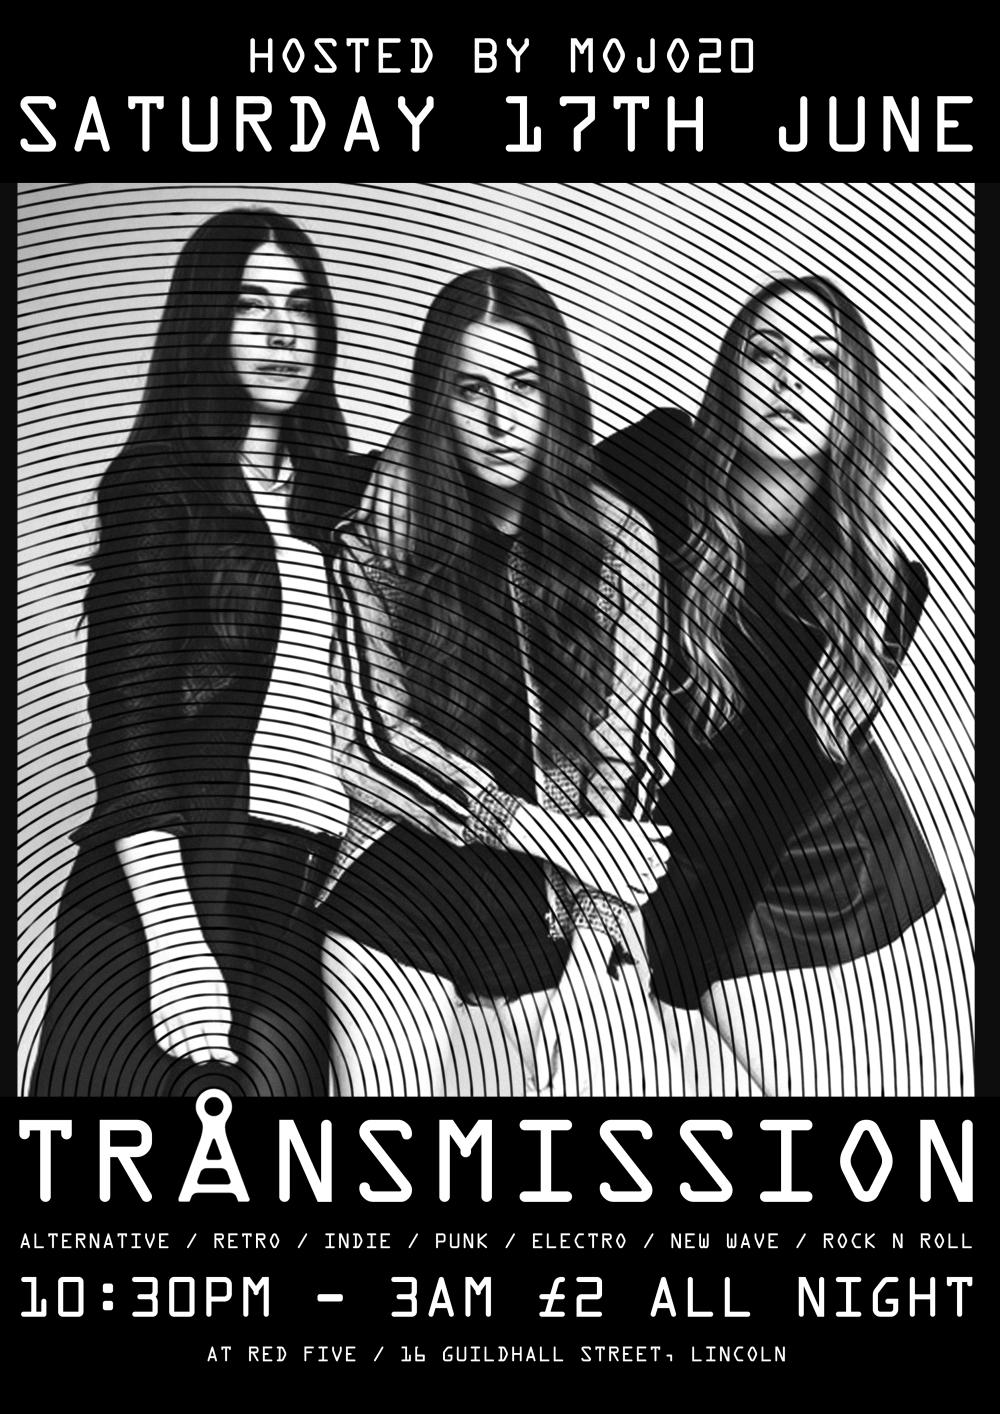 TRANSMISSION JUNE 2017 POSTER.jpg